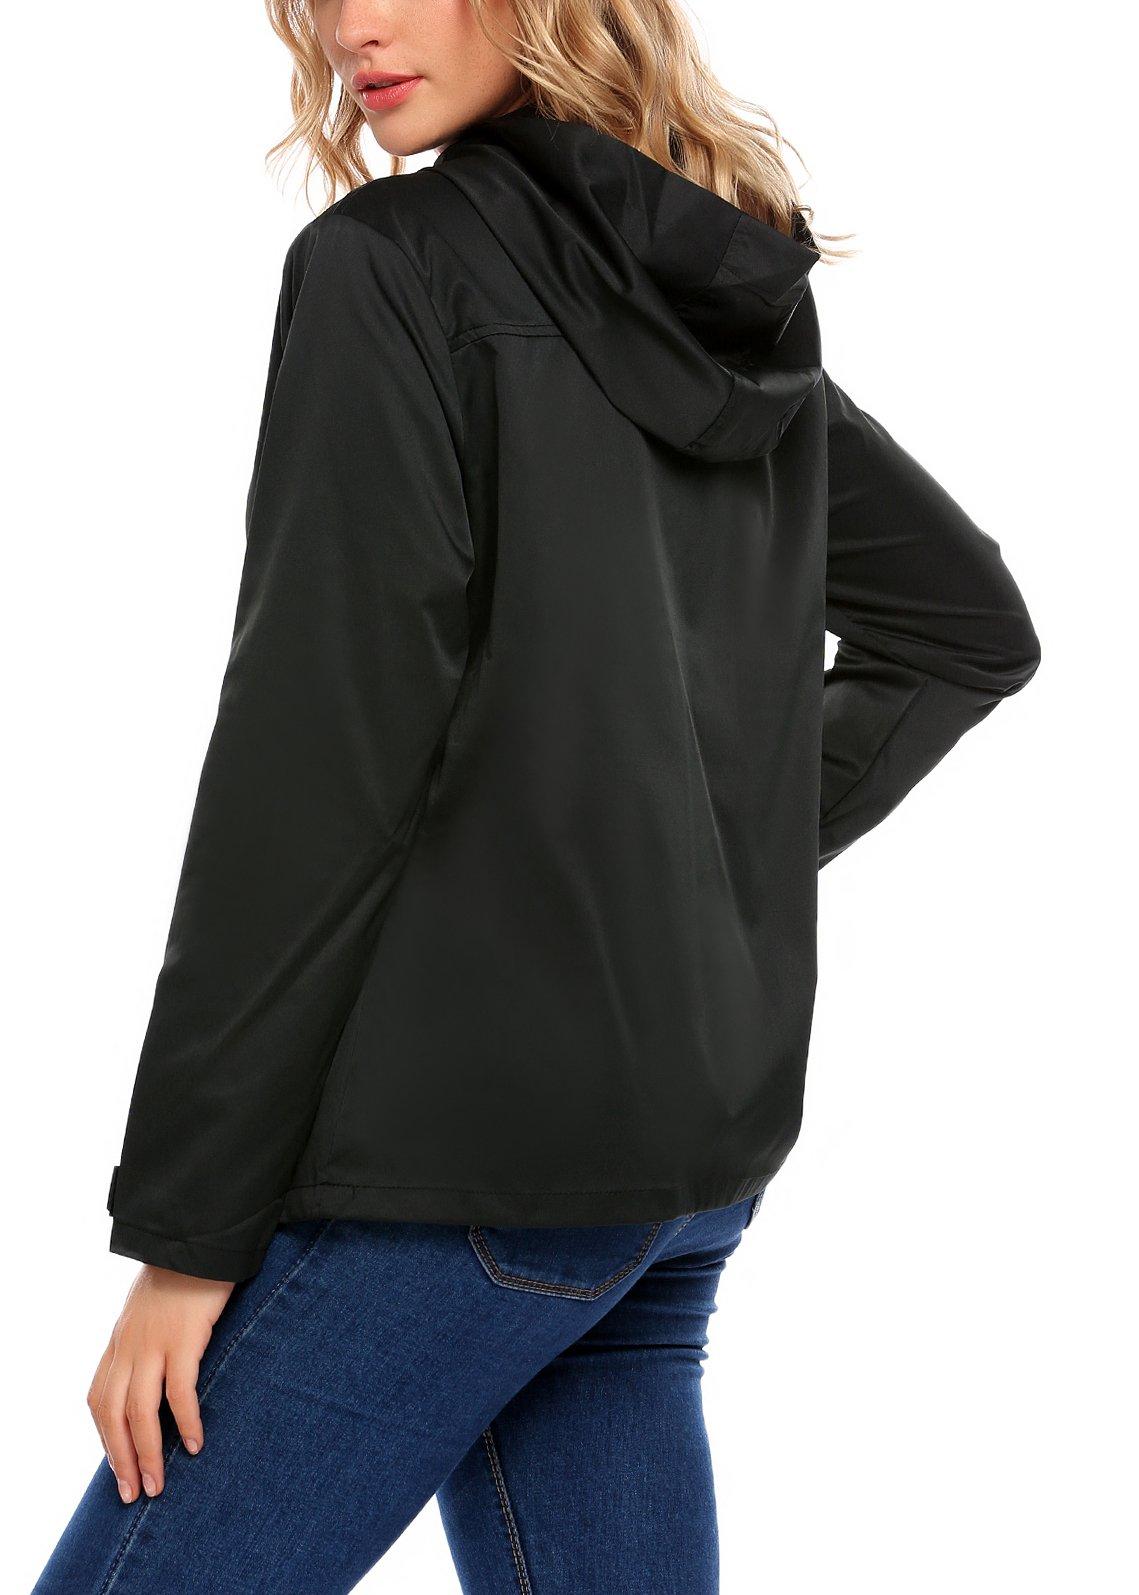 SummerRio Women's Waterproof Venture Resolve Softshell Rainwear Jacket (Black,Medium) by SummerRio (Image #3)